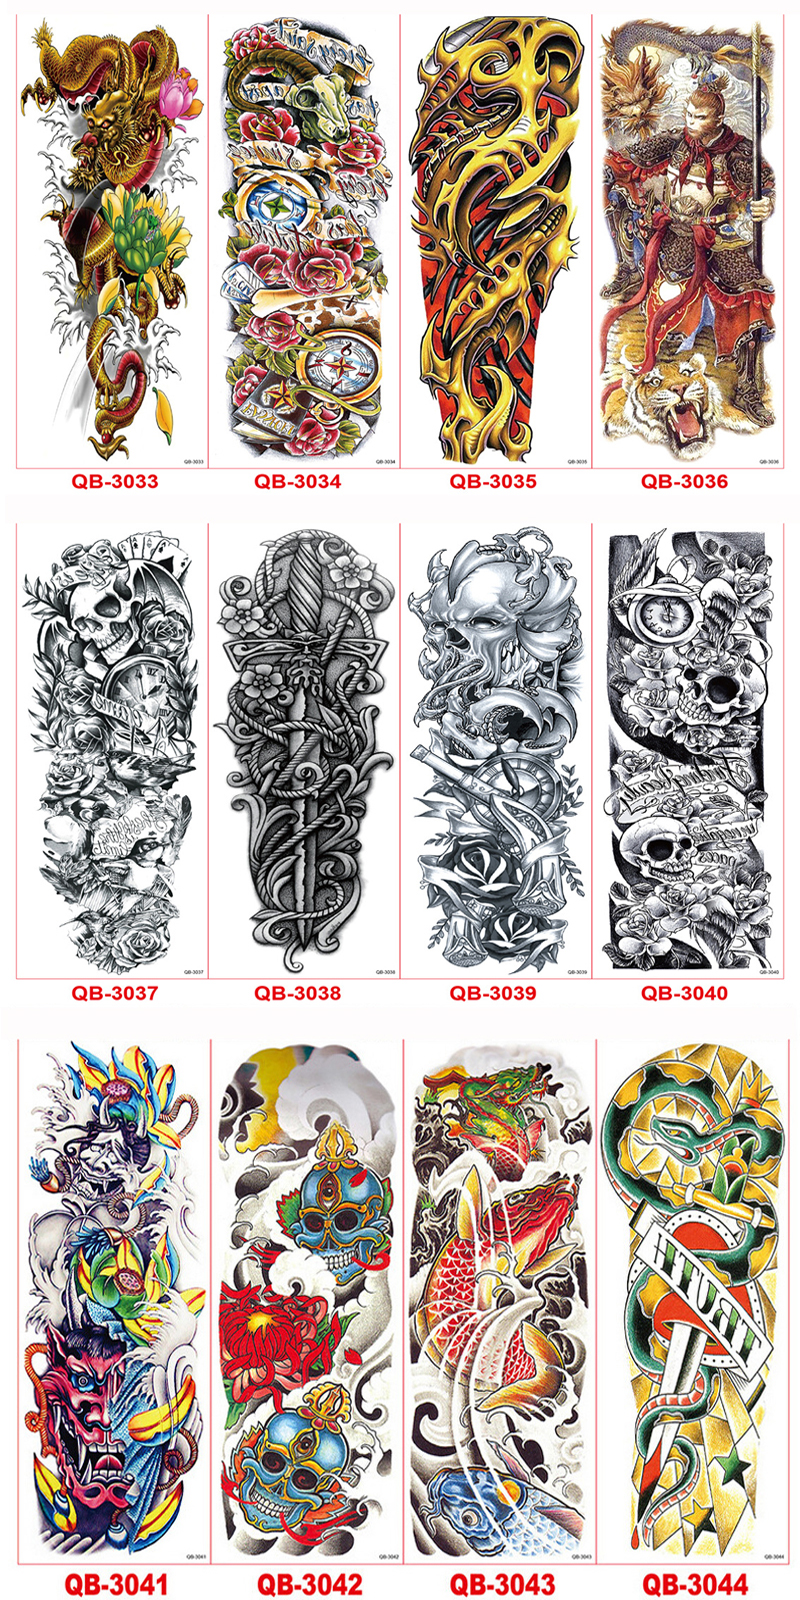 Pcs Waterproof Large Temporary Tattoos Stickers Fake Paste Leg Full Arm Tattoo Sticker Sleeve On The Body Art For Men Women 15